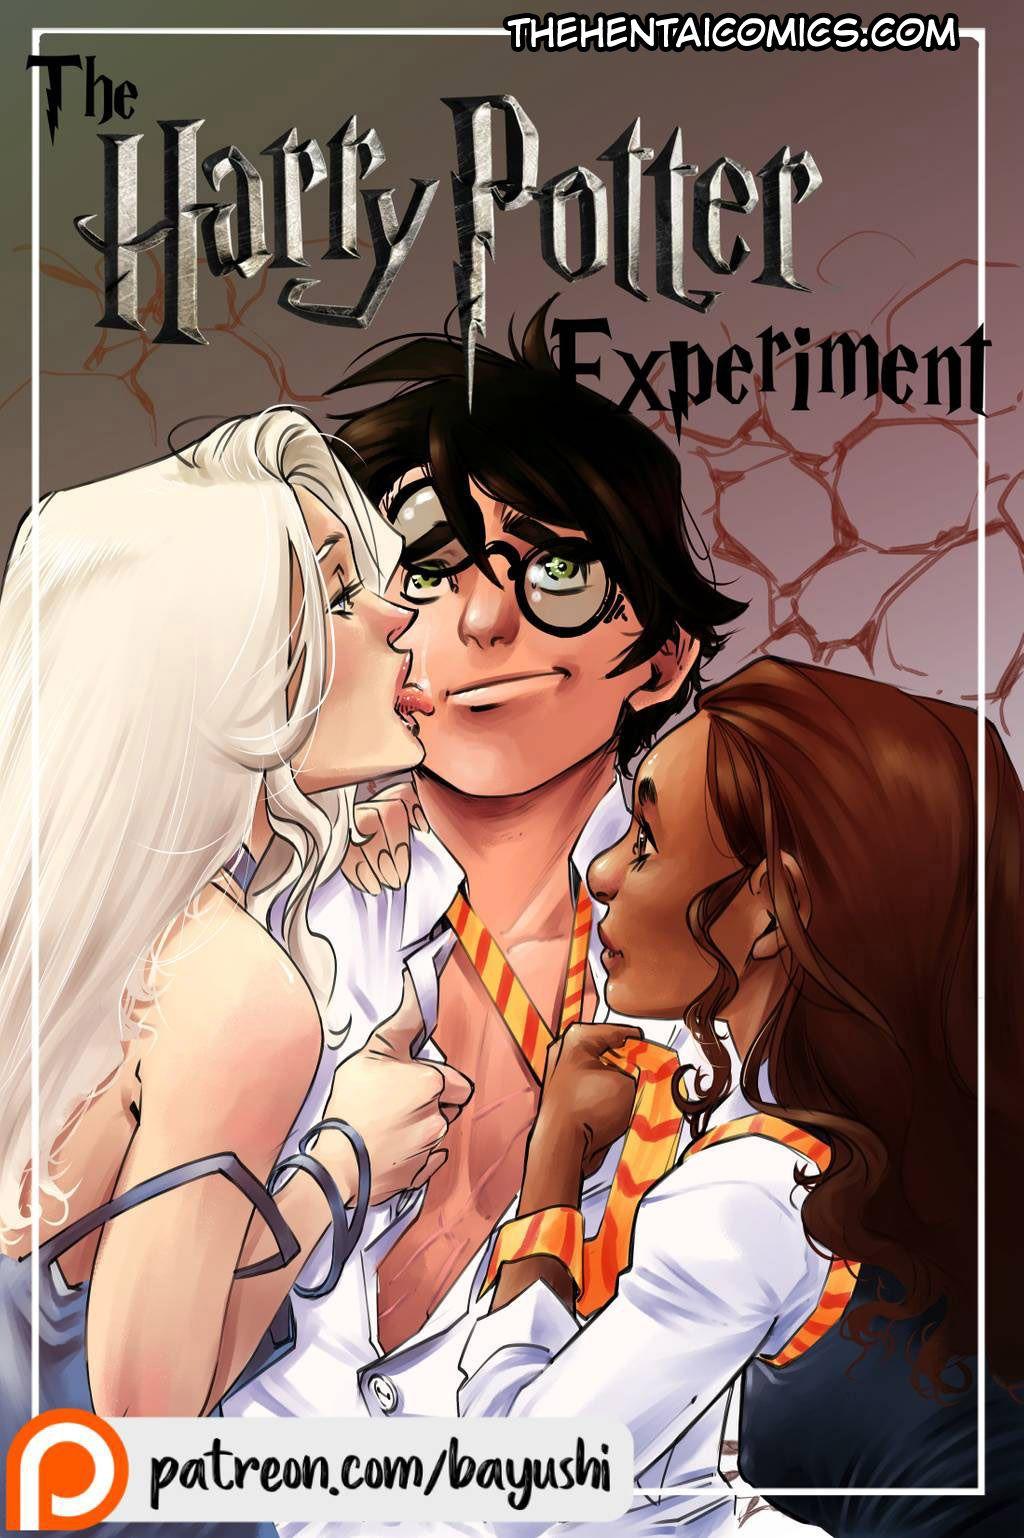 Harry Potter enfeitiçando as ninfetinhas gostosas